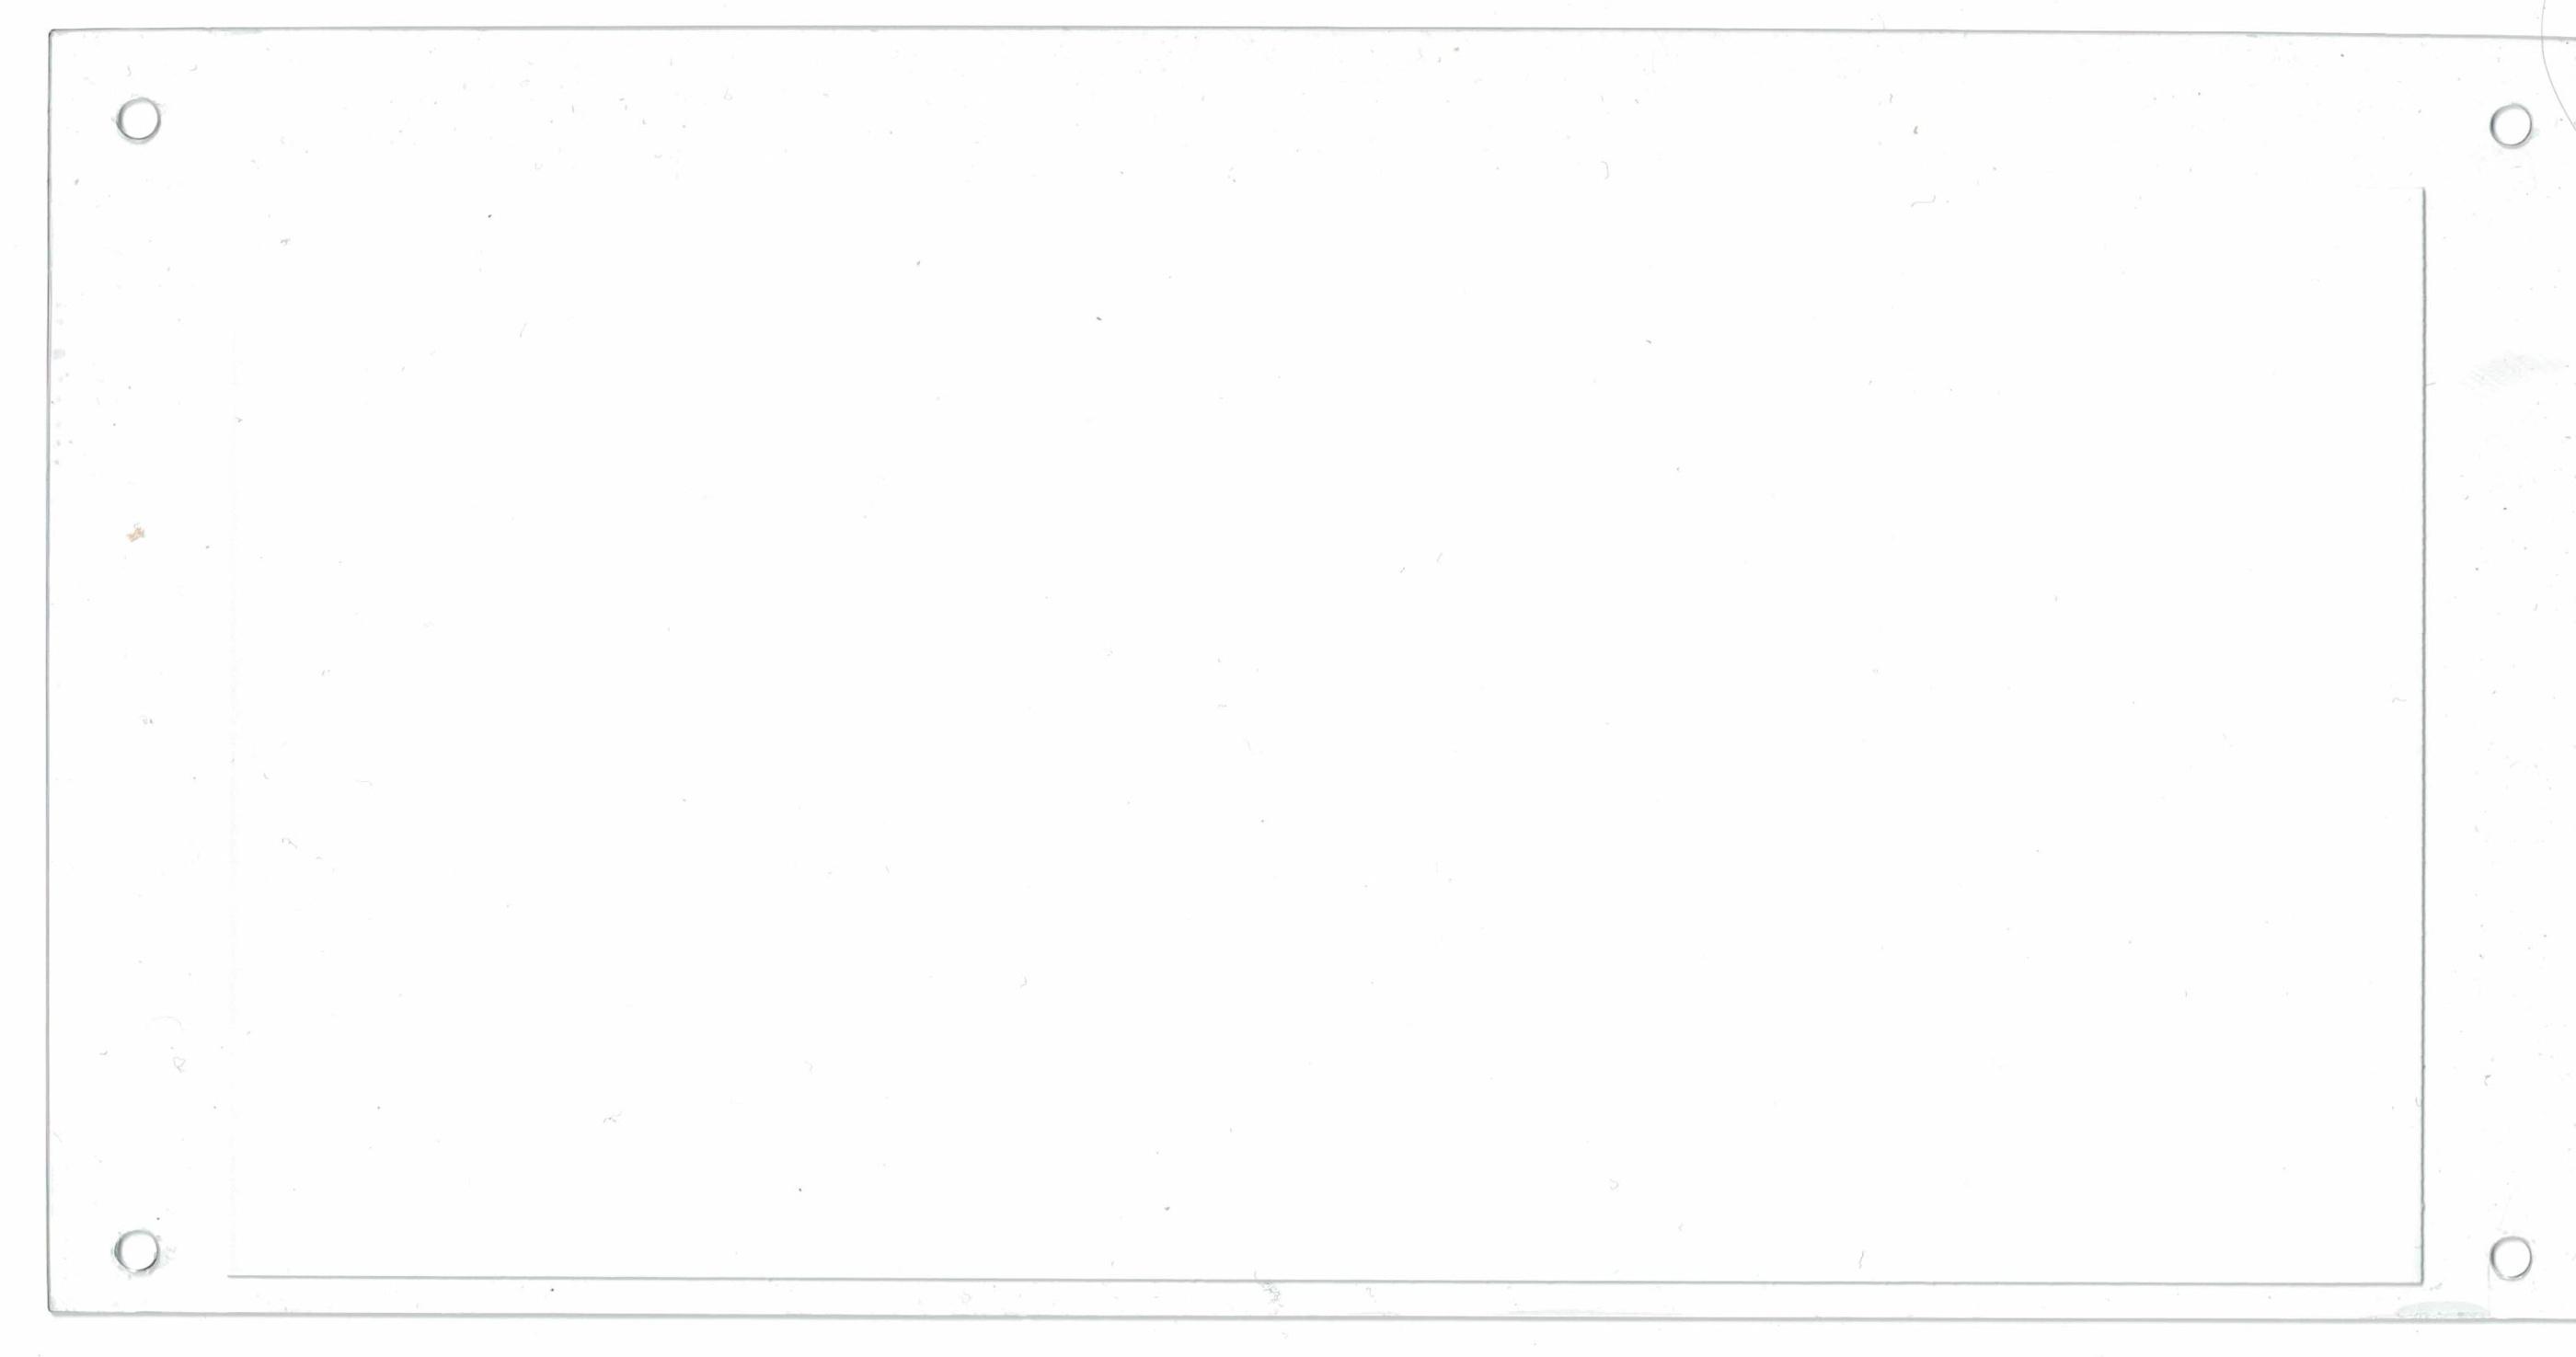 Frontskiva U 25 blank 288x145mm 16-7200-23               20180130